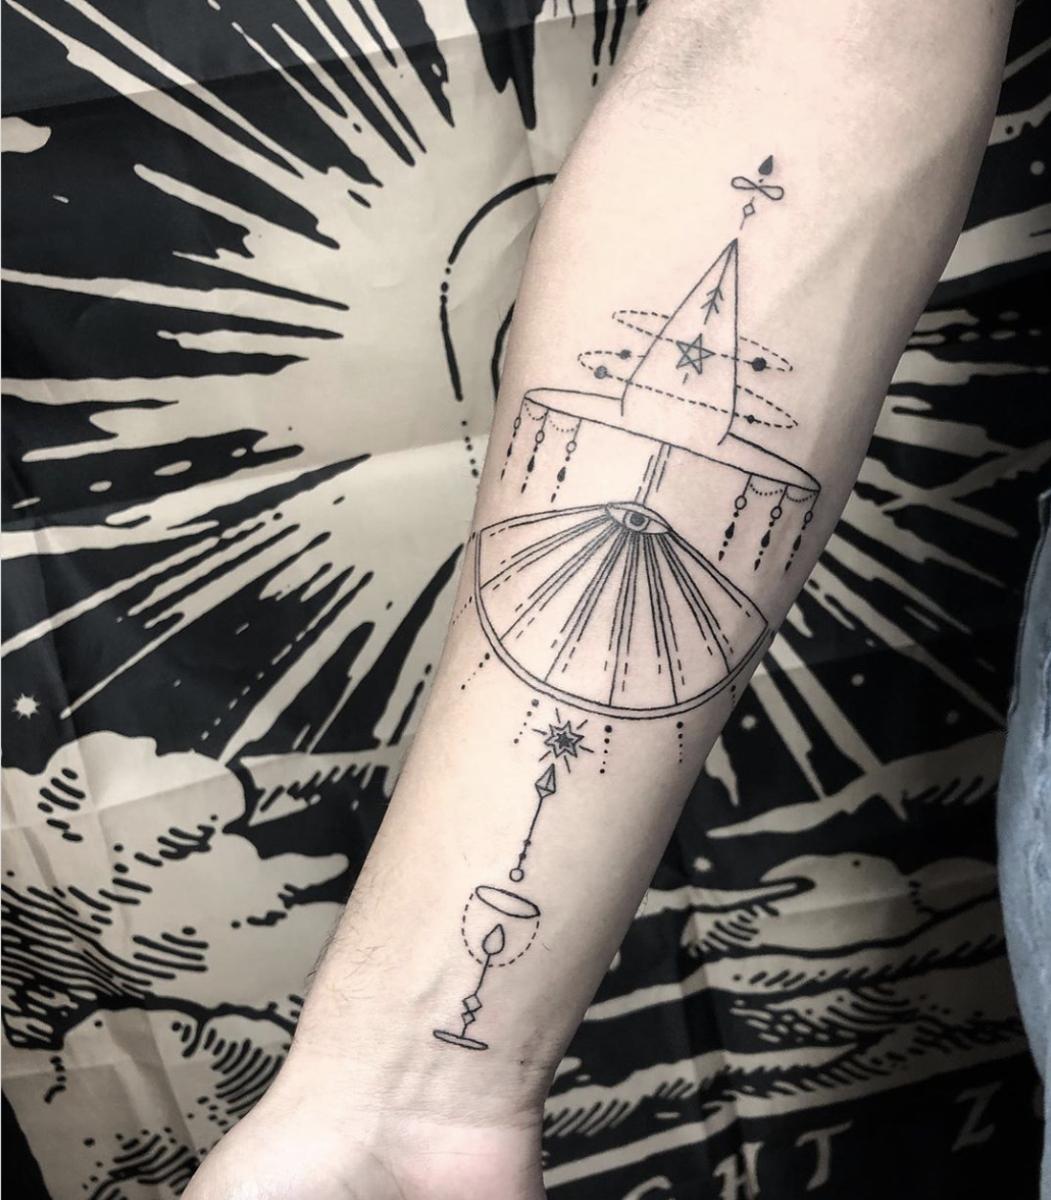 By Jax @jackieparanoia at 7 Souls Tattoo